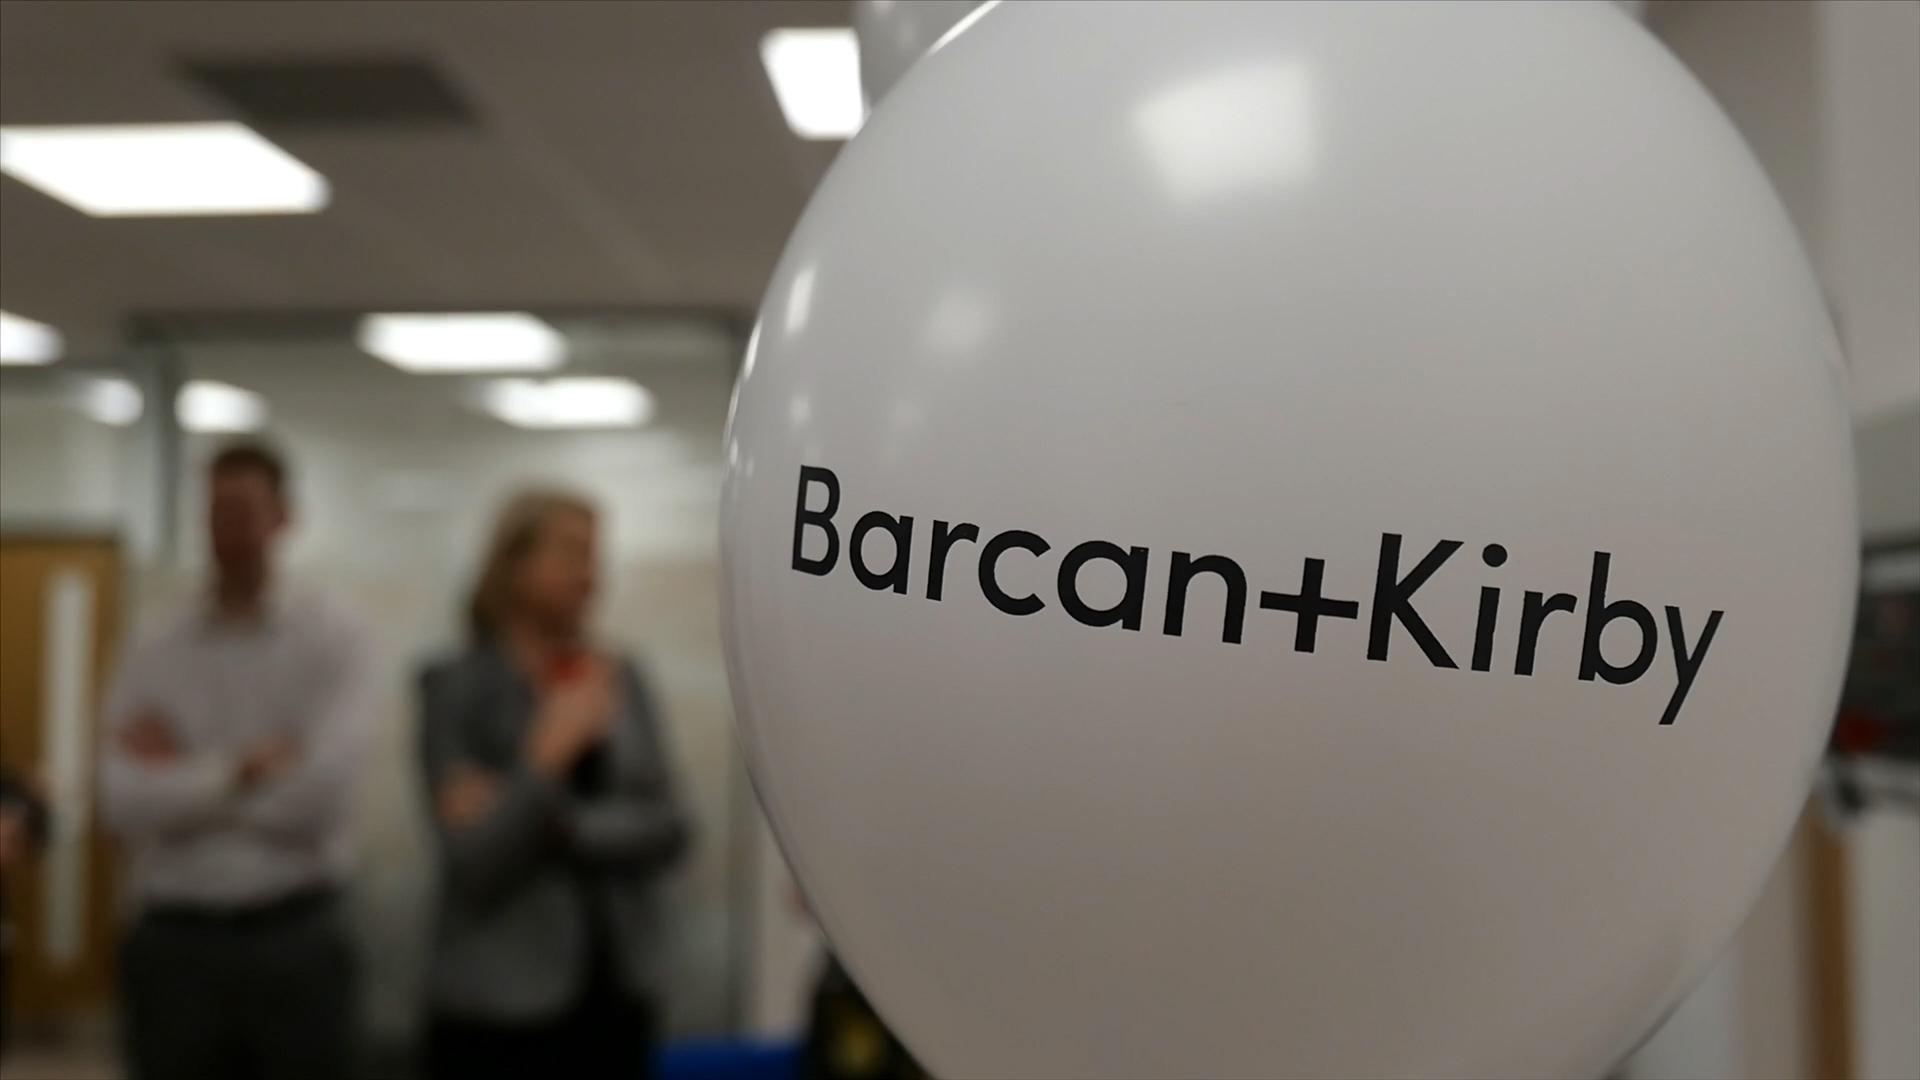 barcan-kirby-balloons